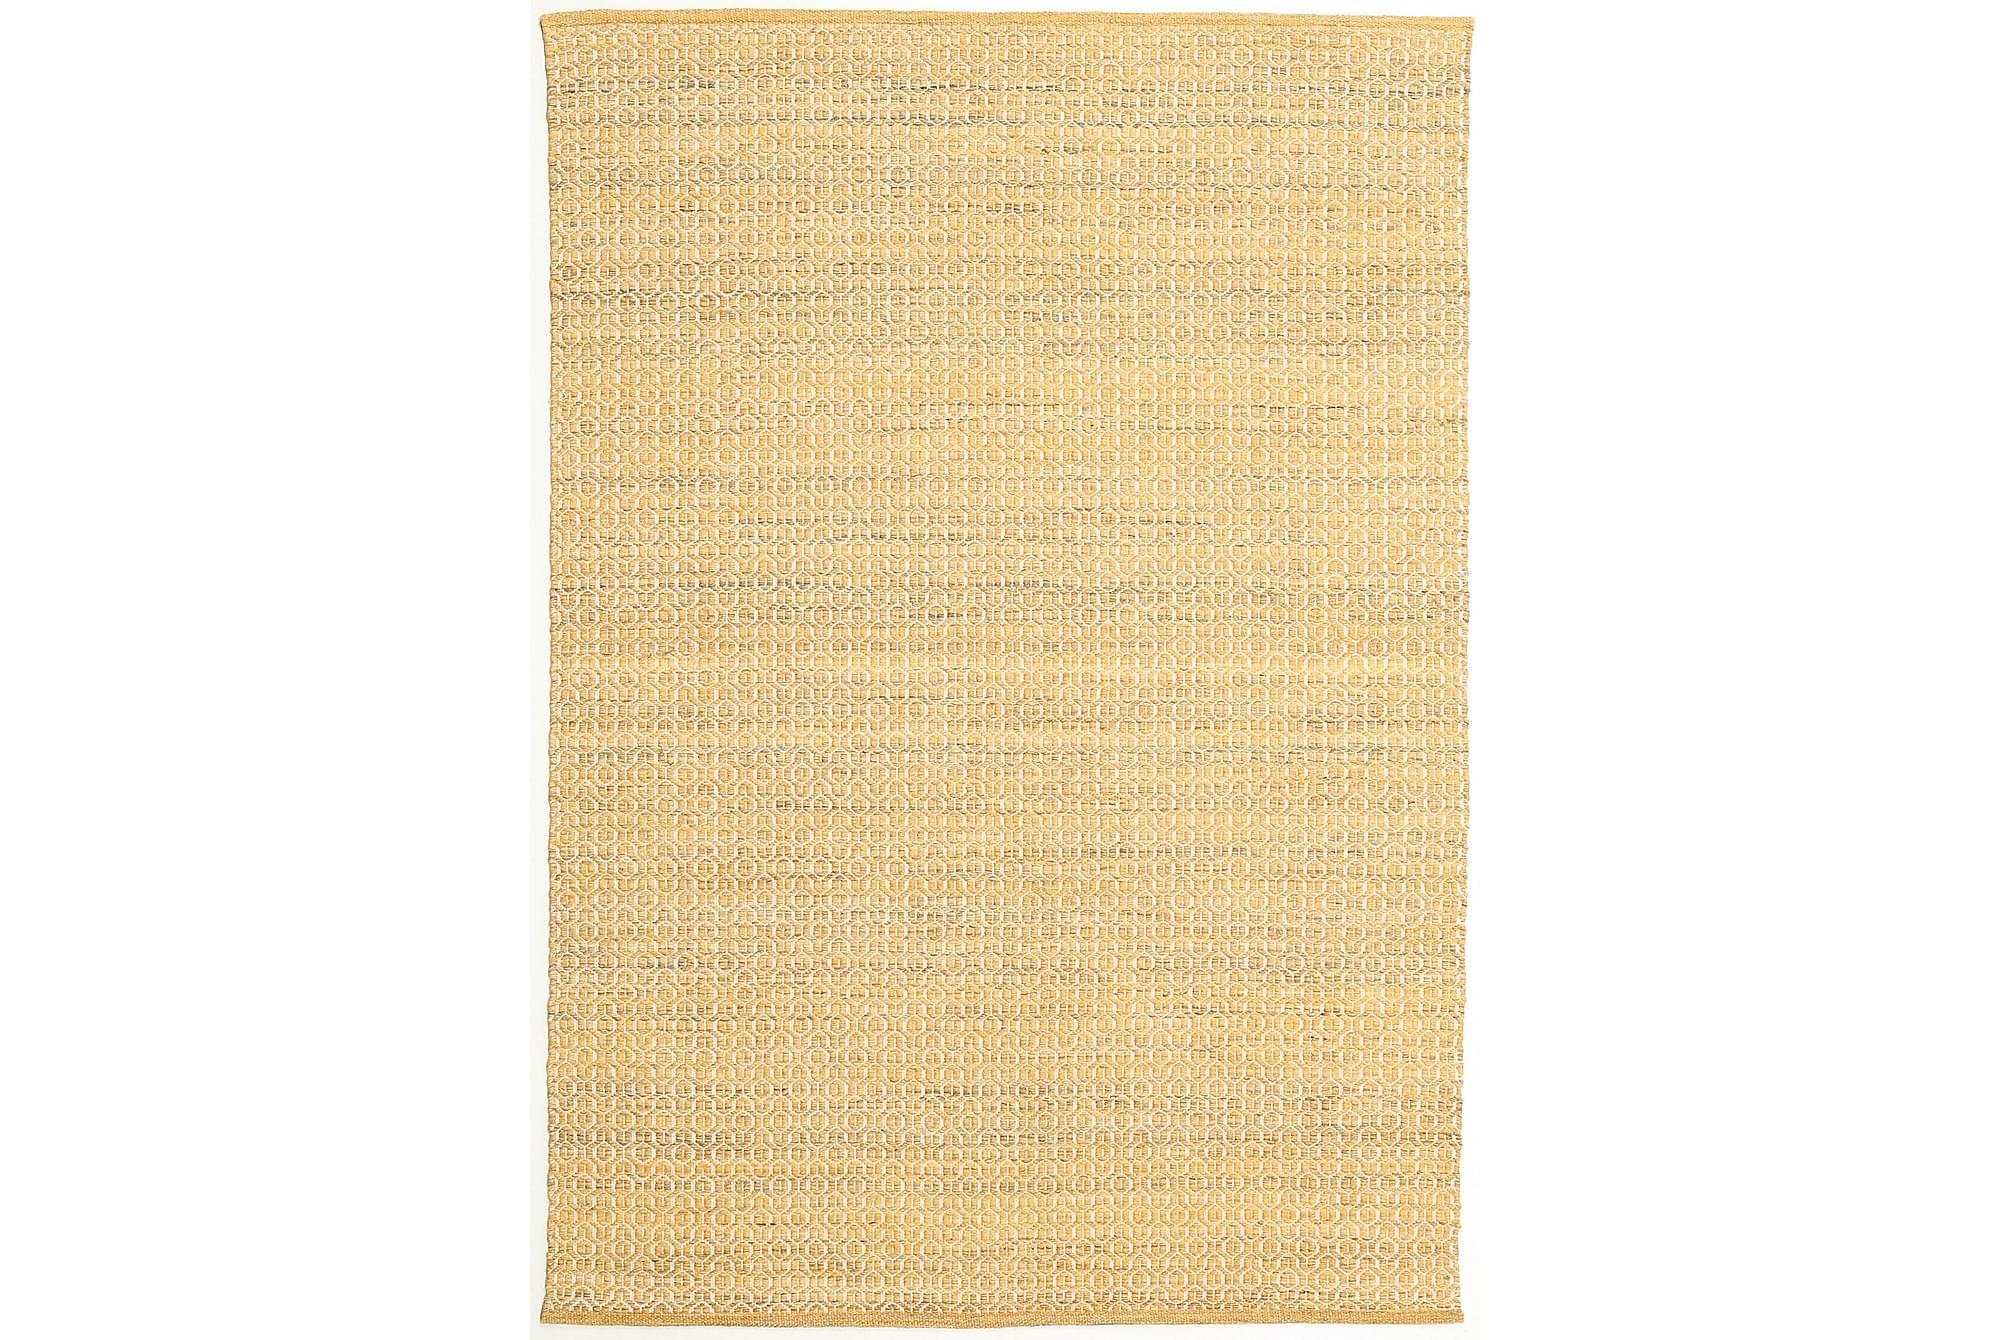 ALVA Matta 160x230 Guld/Vit, Stora mattor